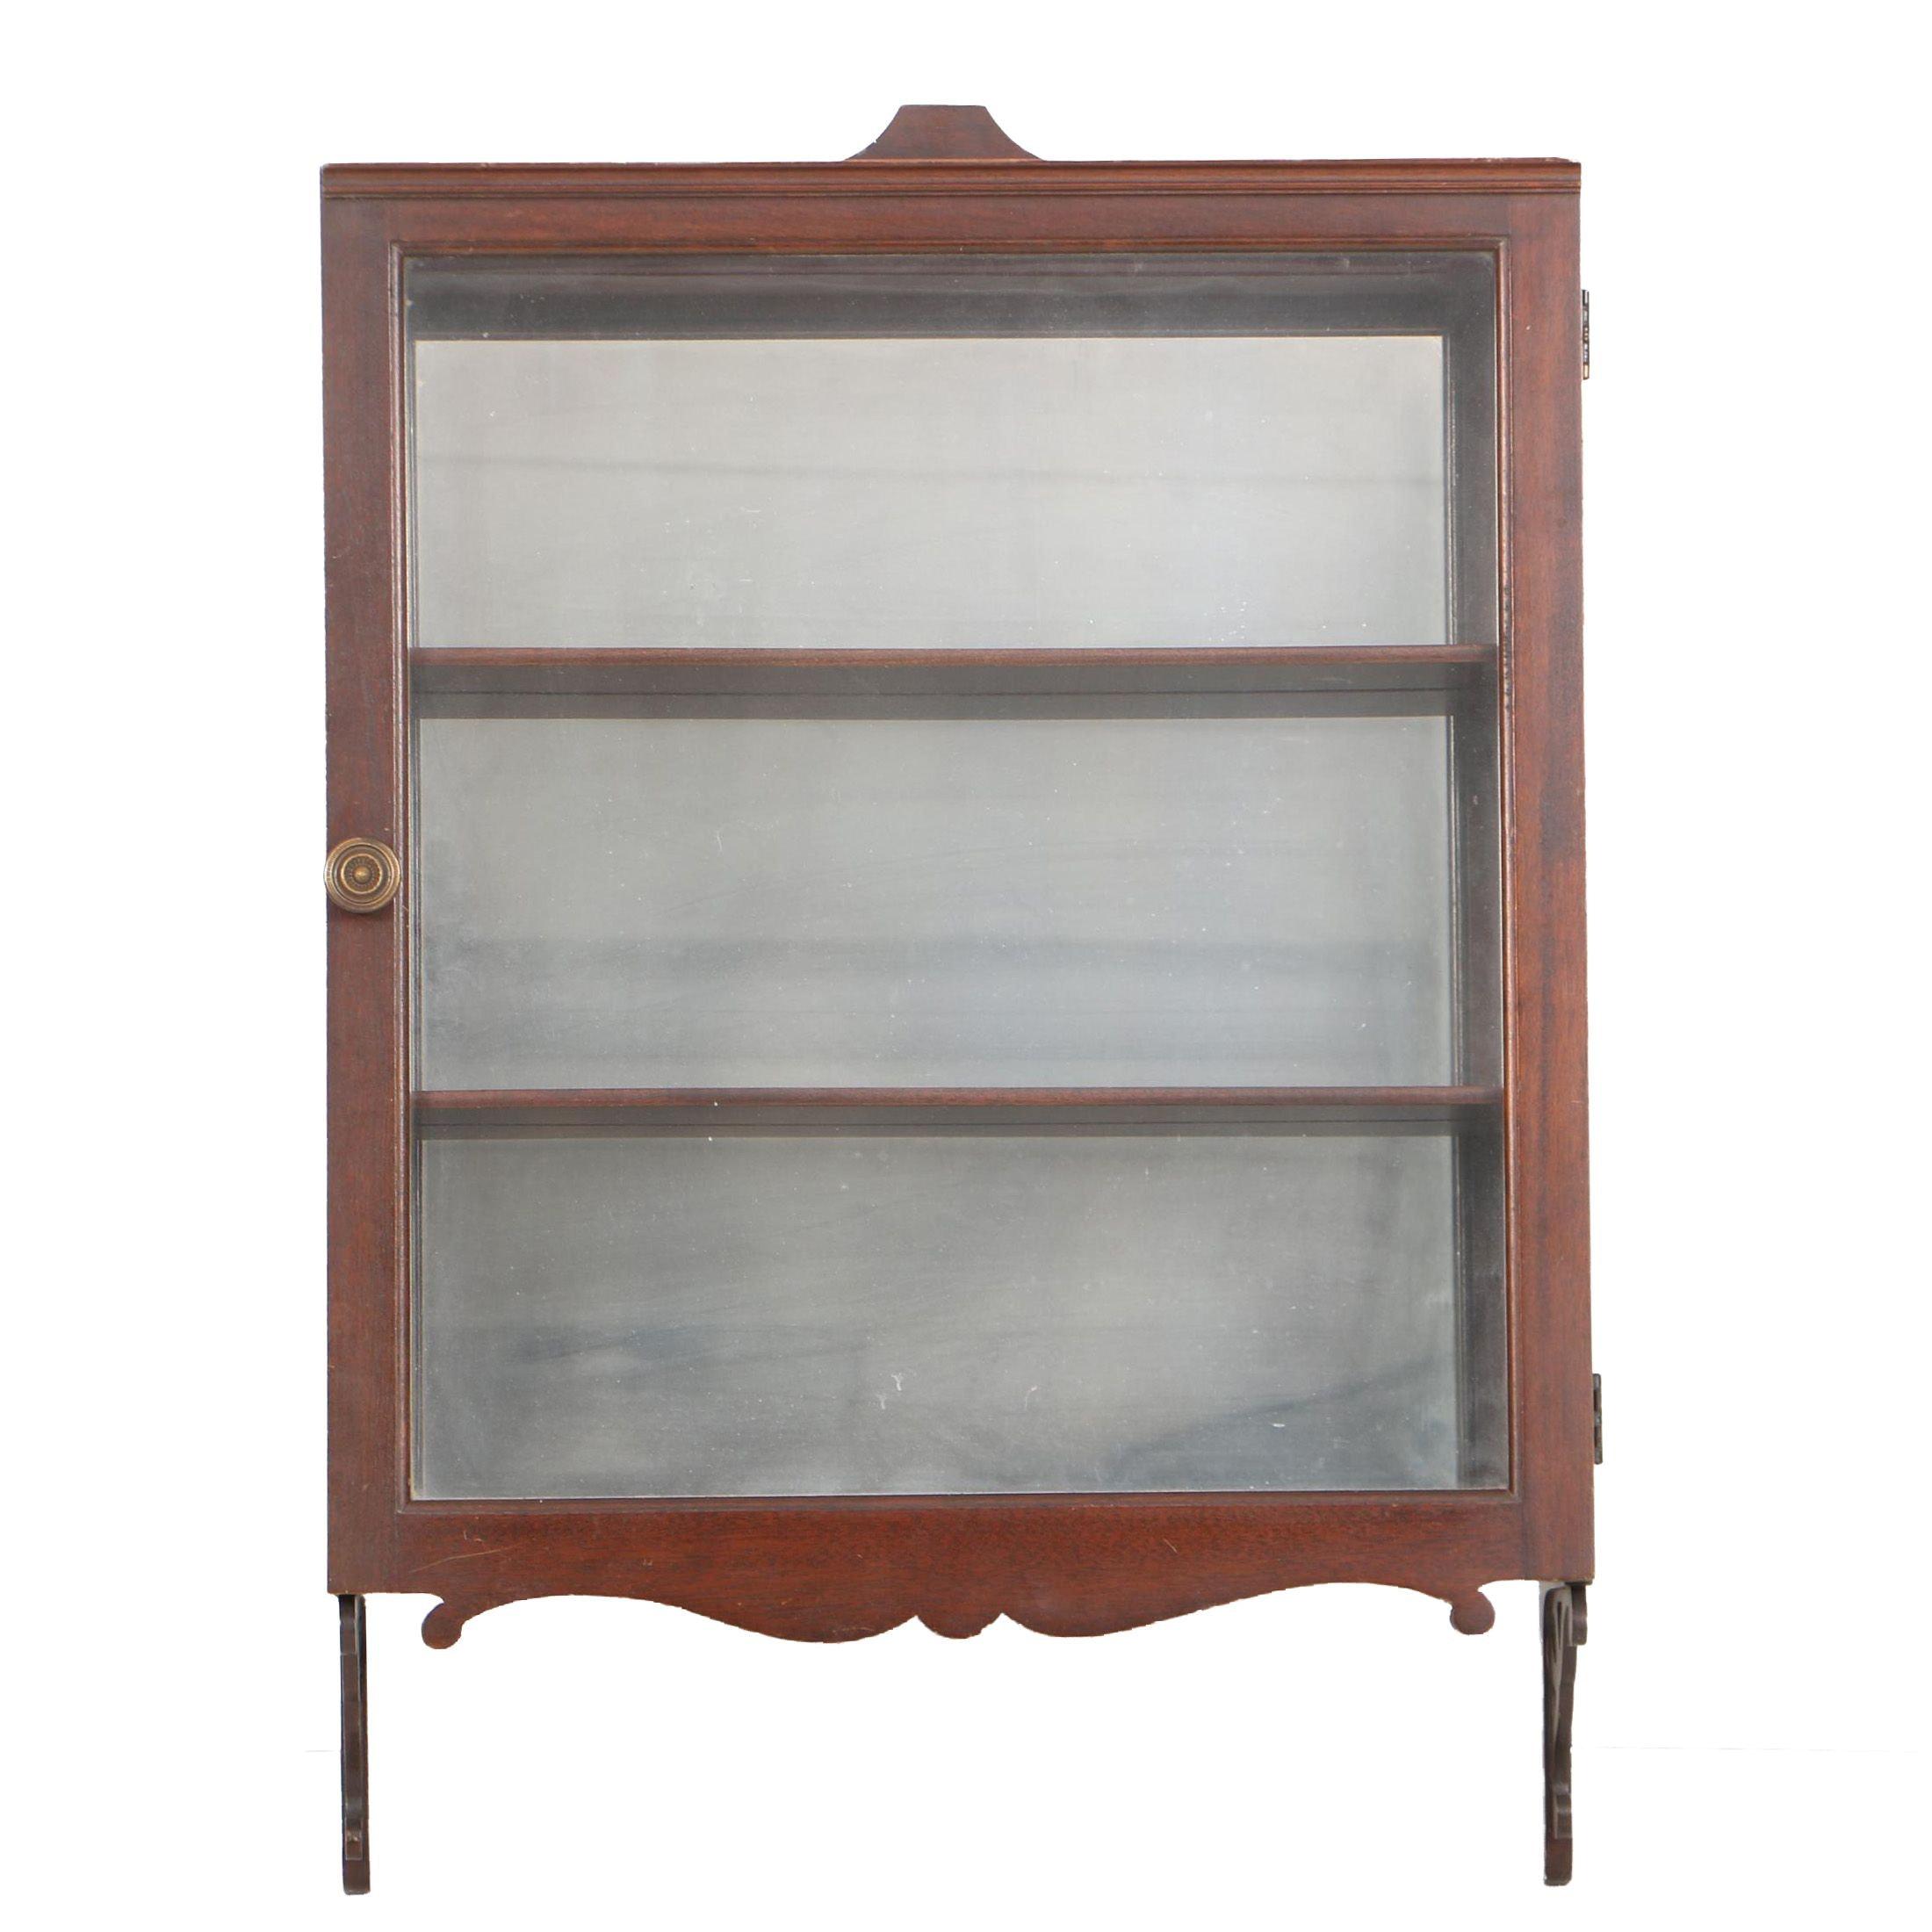 Vintage Mahogany Hanging Display Cabinet